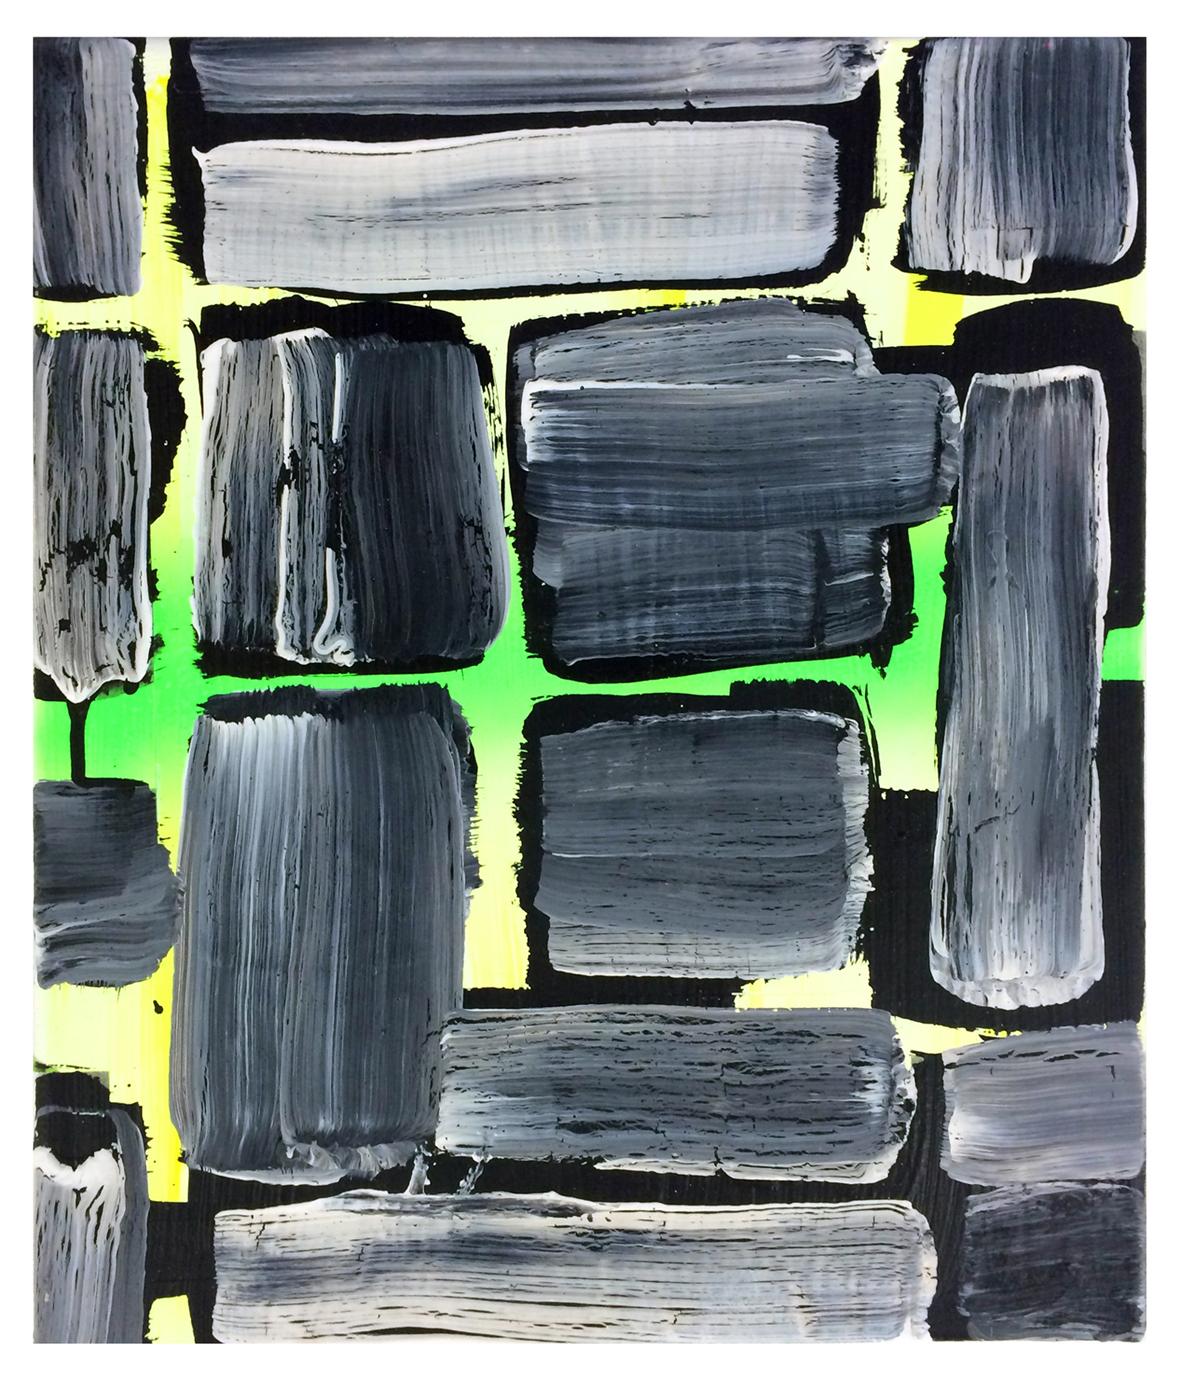 'Untitled', 2014, acrylic and spray paint on canvas, 20 x 25 cm